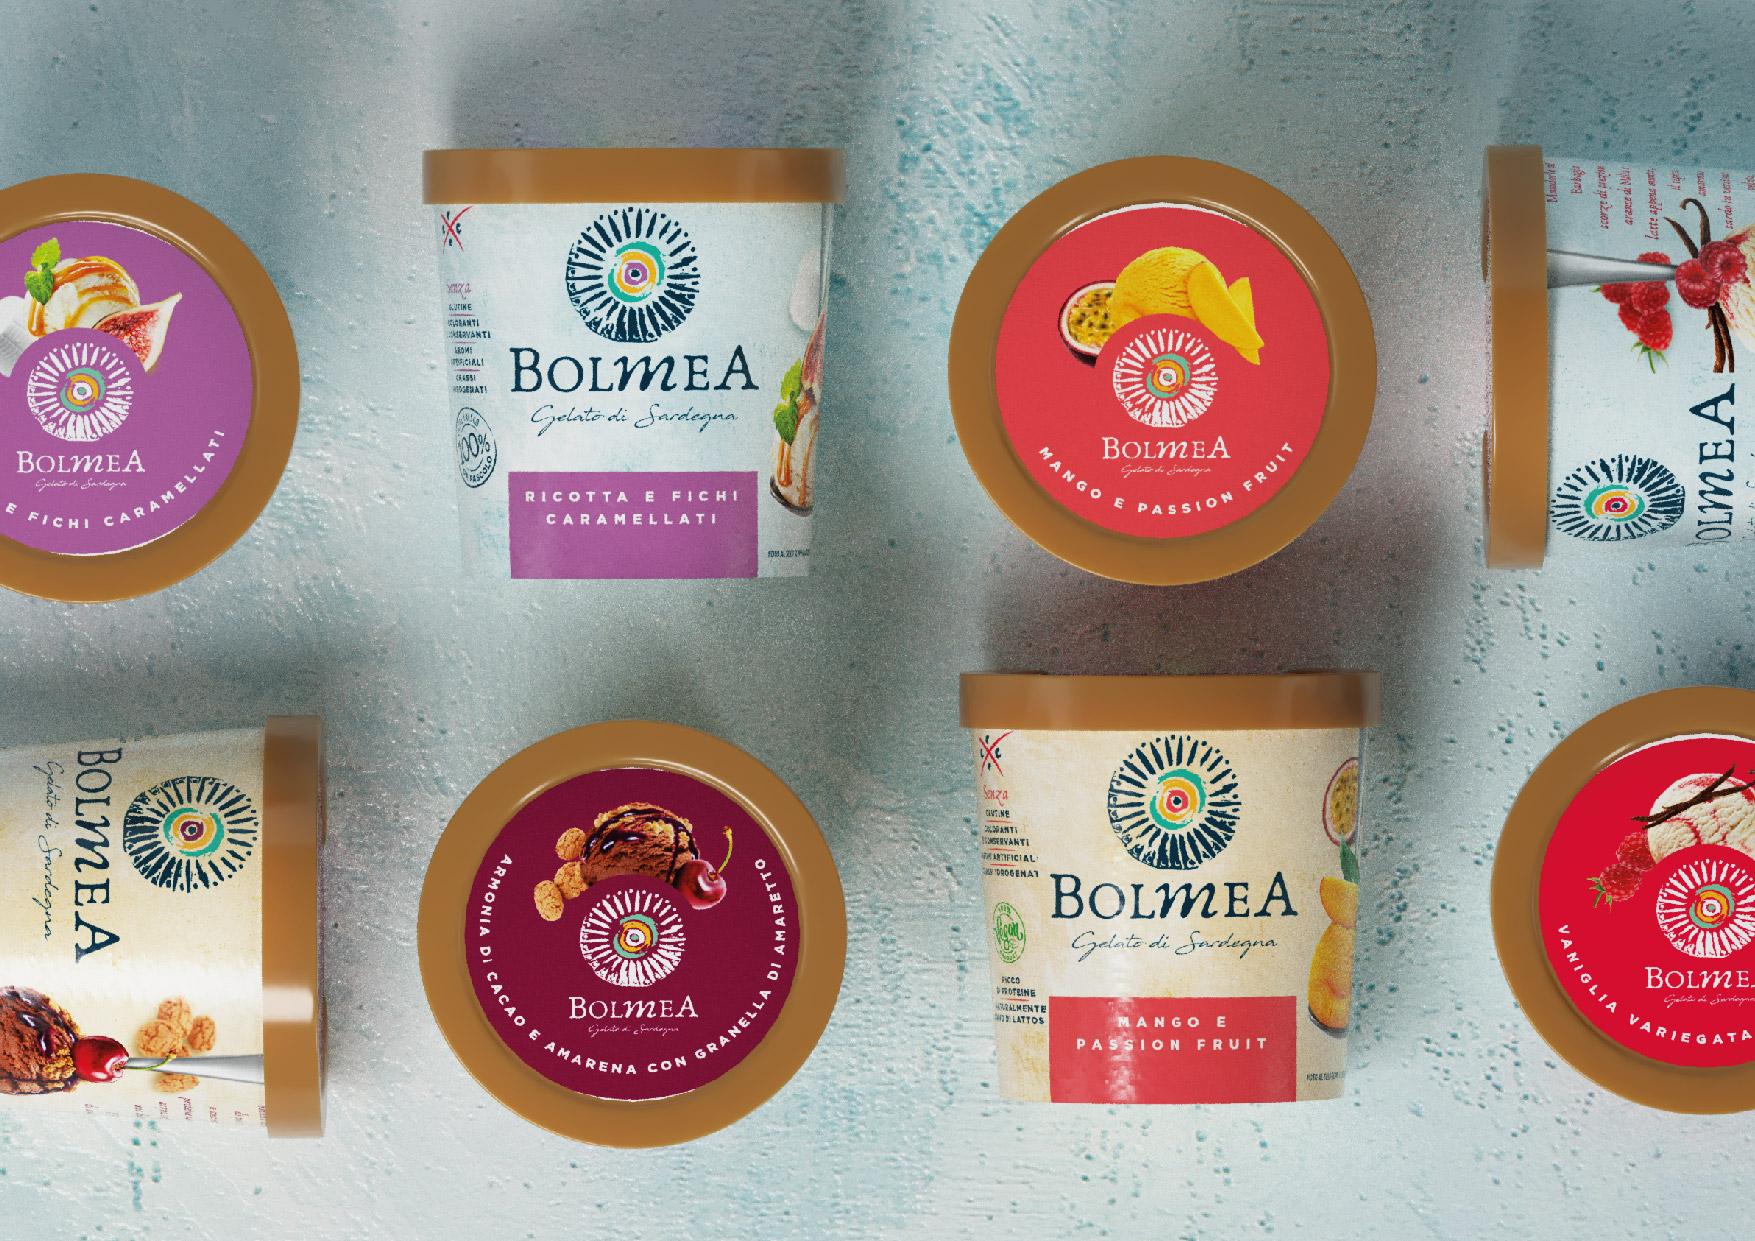 Bolmea Ice Cream From Sardinia